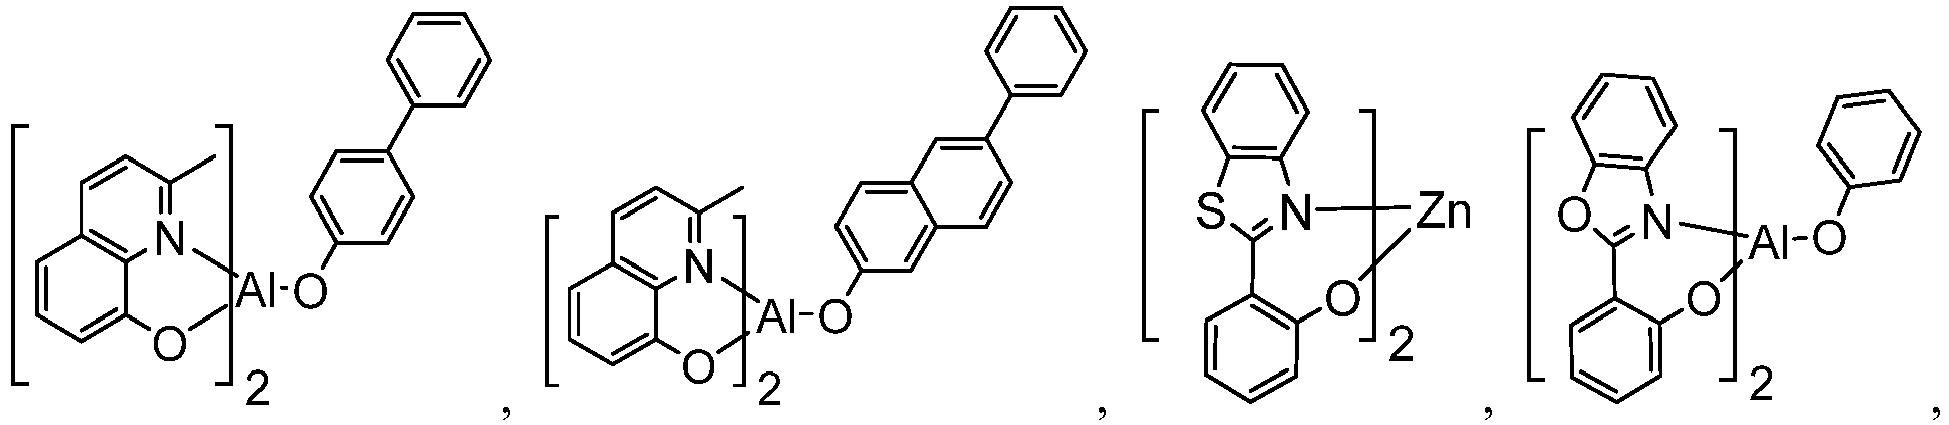 Figure imgb0905